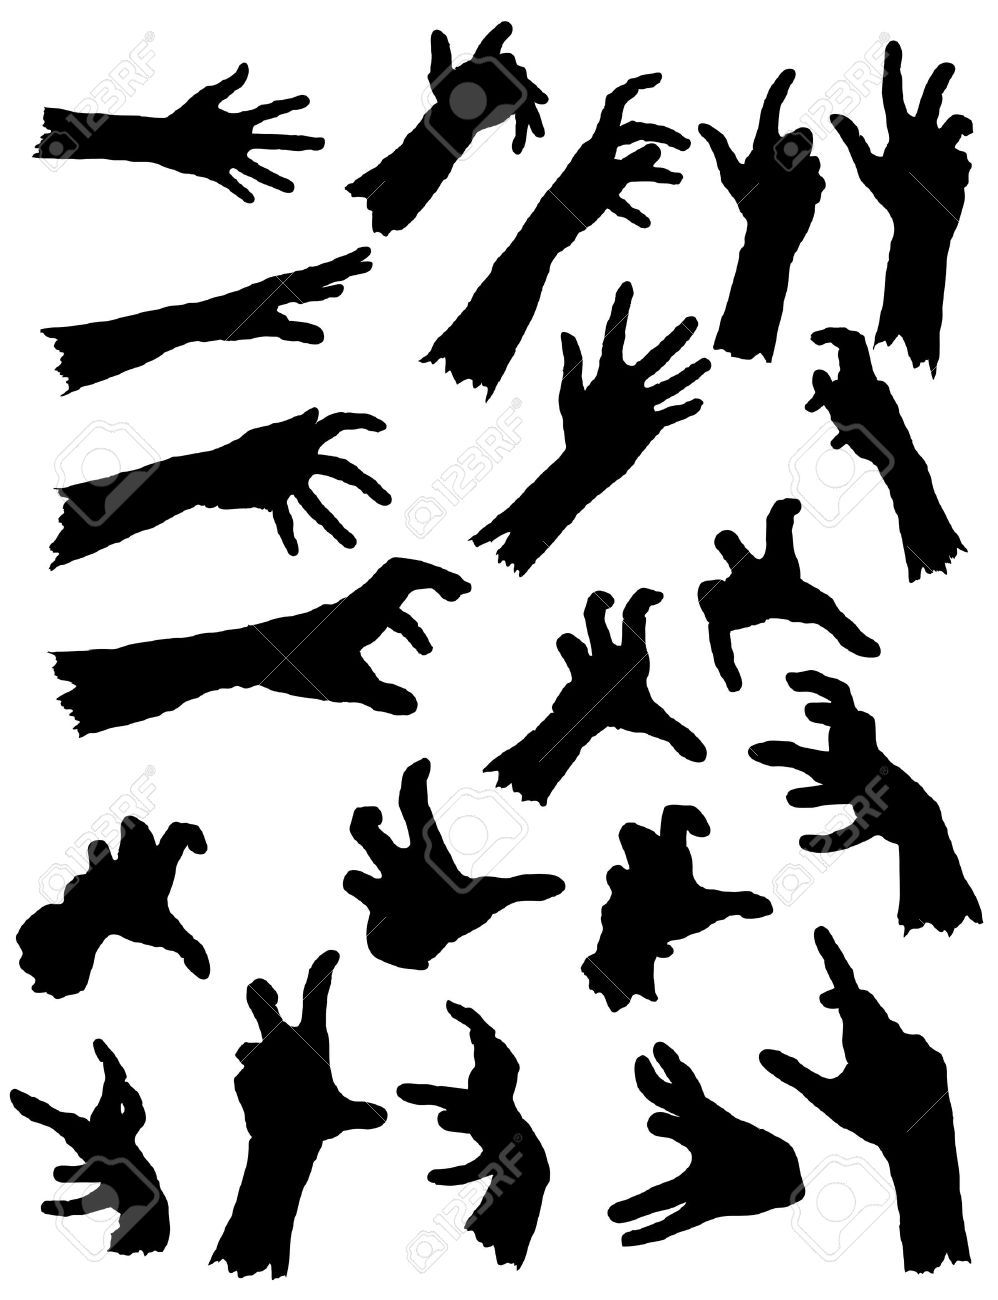 46738268 Collection Of Zombie Hands In Different Poses Stock Vector Hand Jpg 998 1300 Arte De Halloween Pinturas Pequenas Plantillas Graffiti